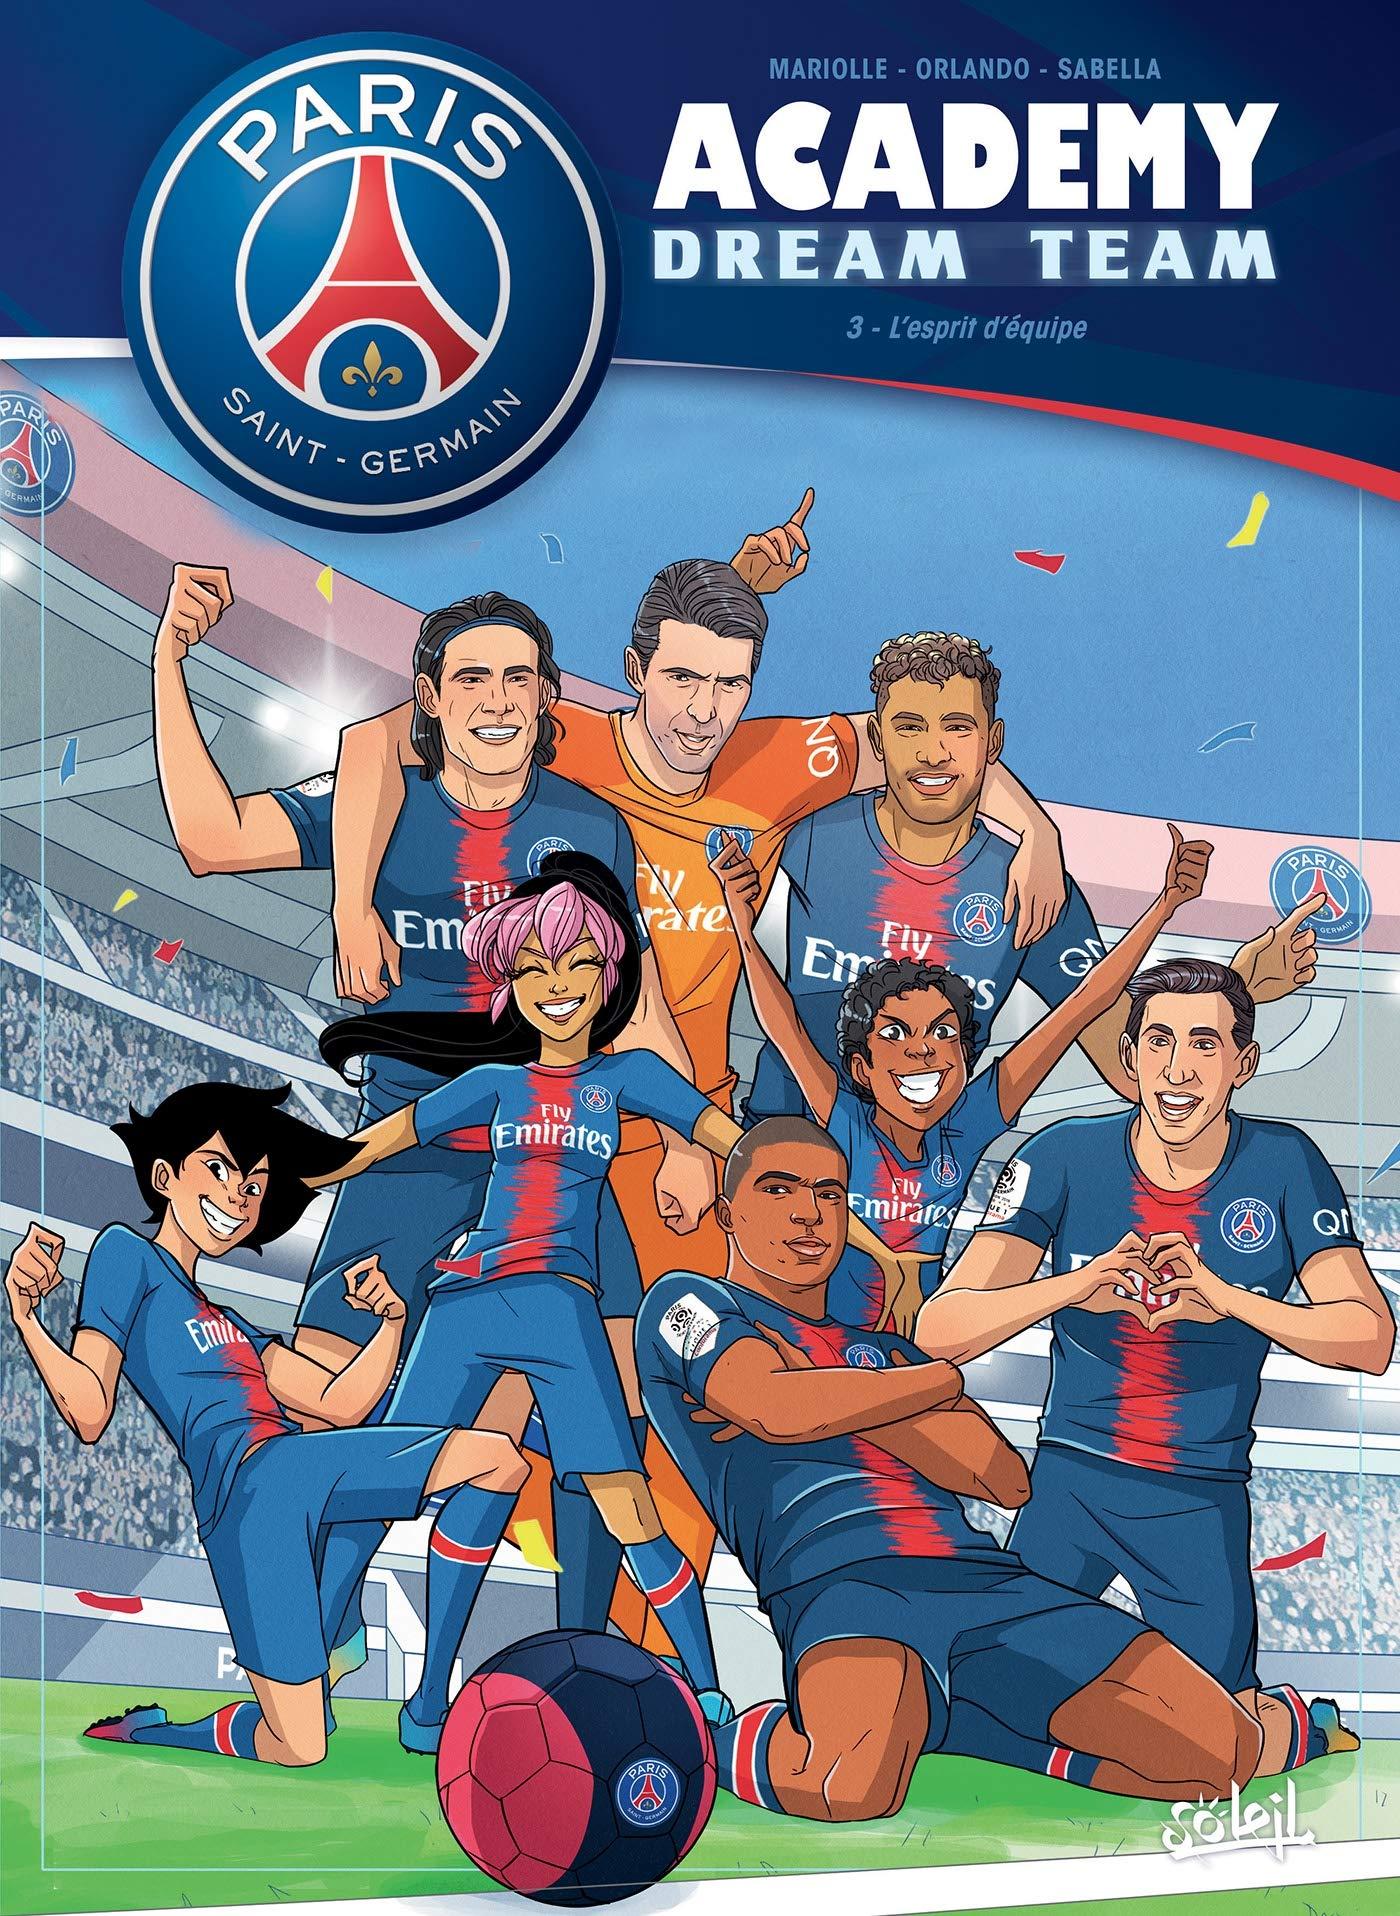 Paris Saint-Germain academy dream team 3 - Esprit d'équipe